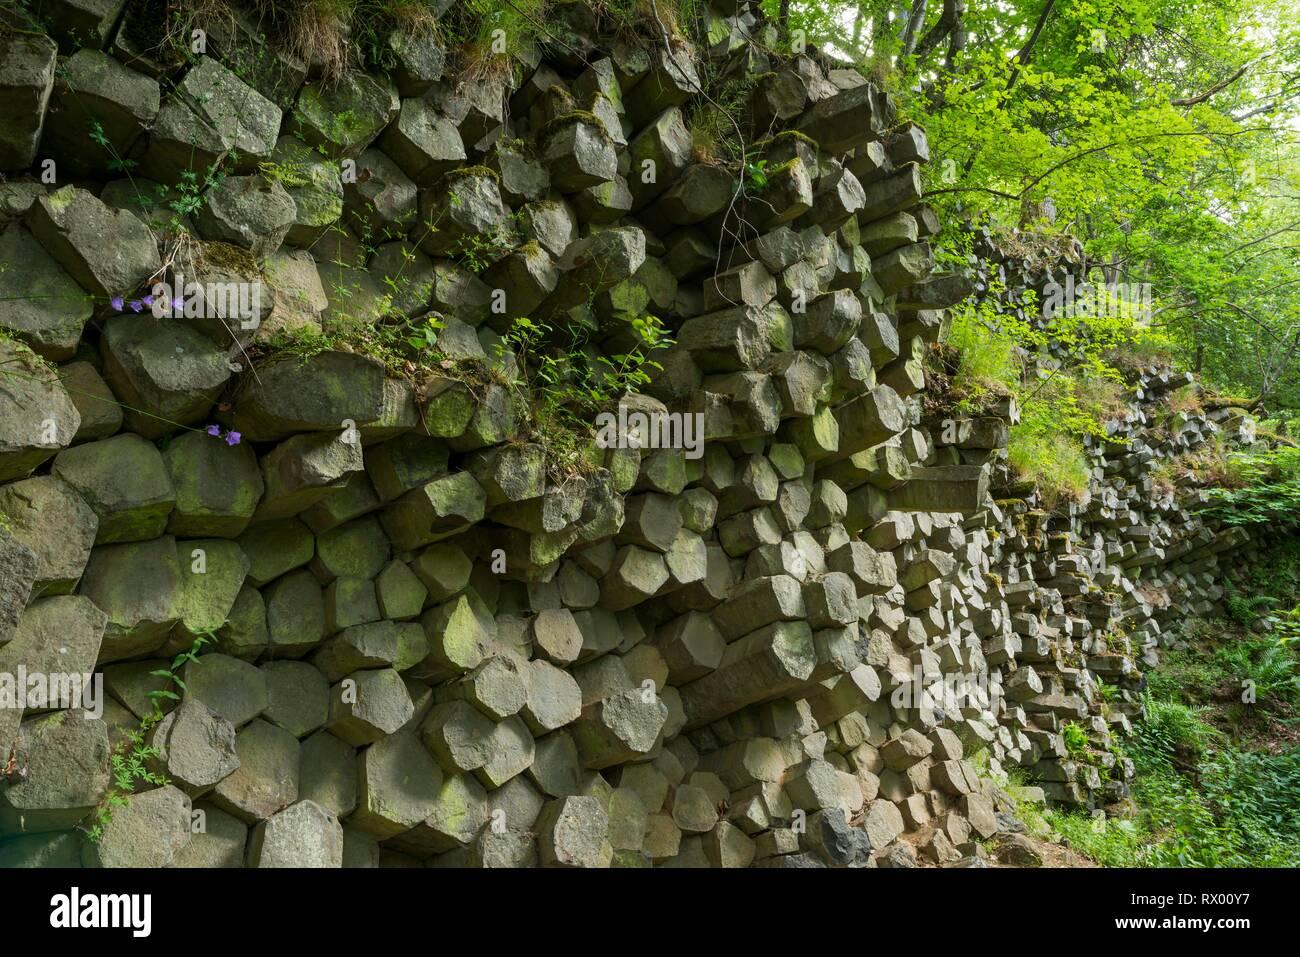 Basalt prisms, Gangolfsberg, Rhön Biosphere Reserve, Bavaria, Germany Stock Photo